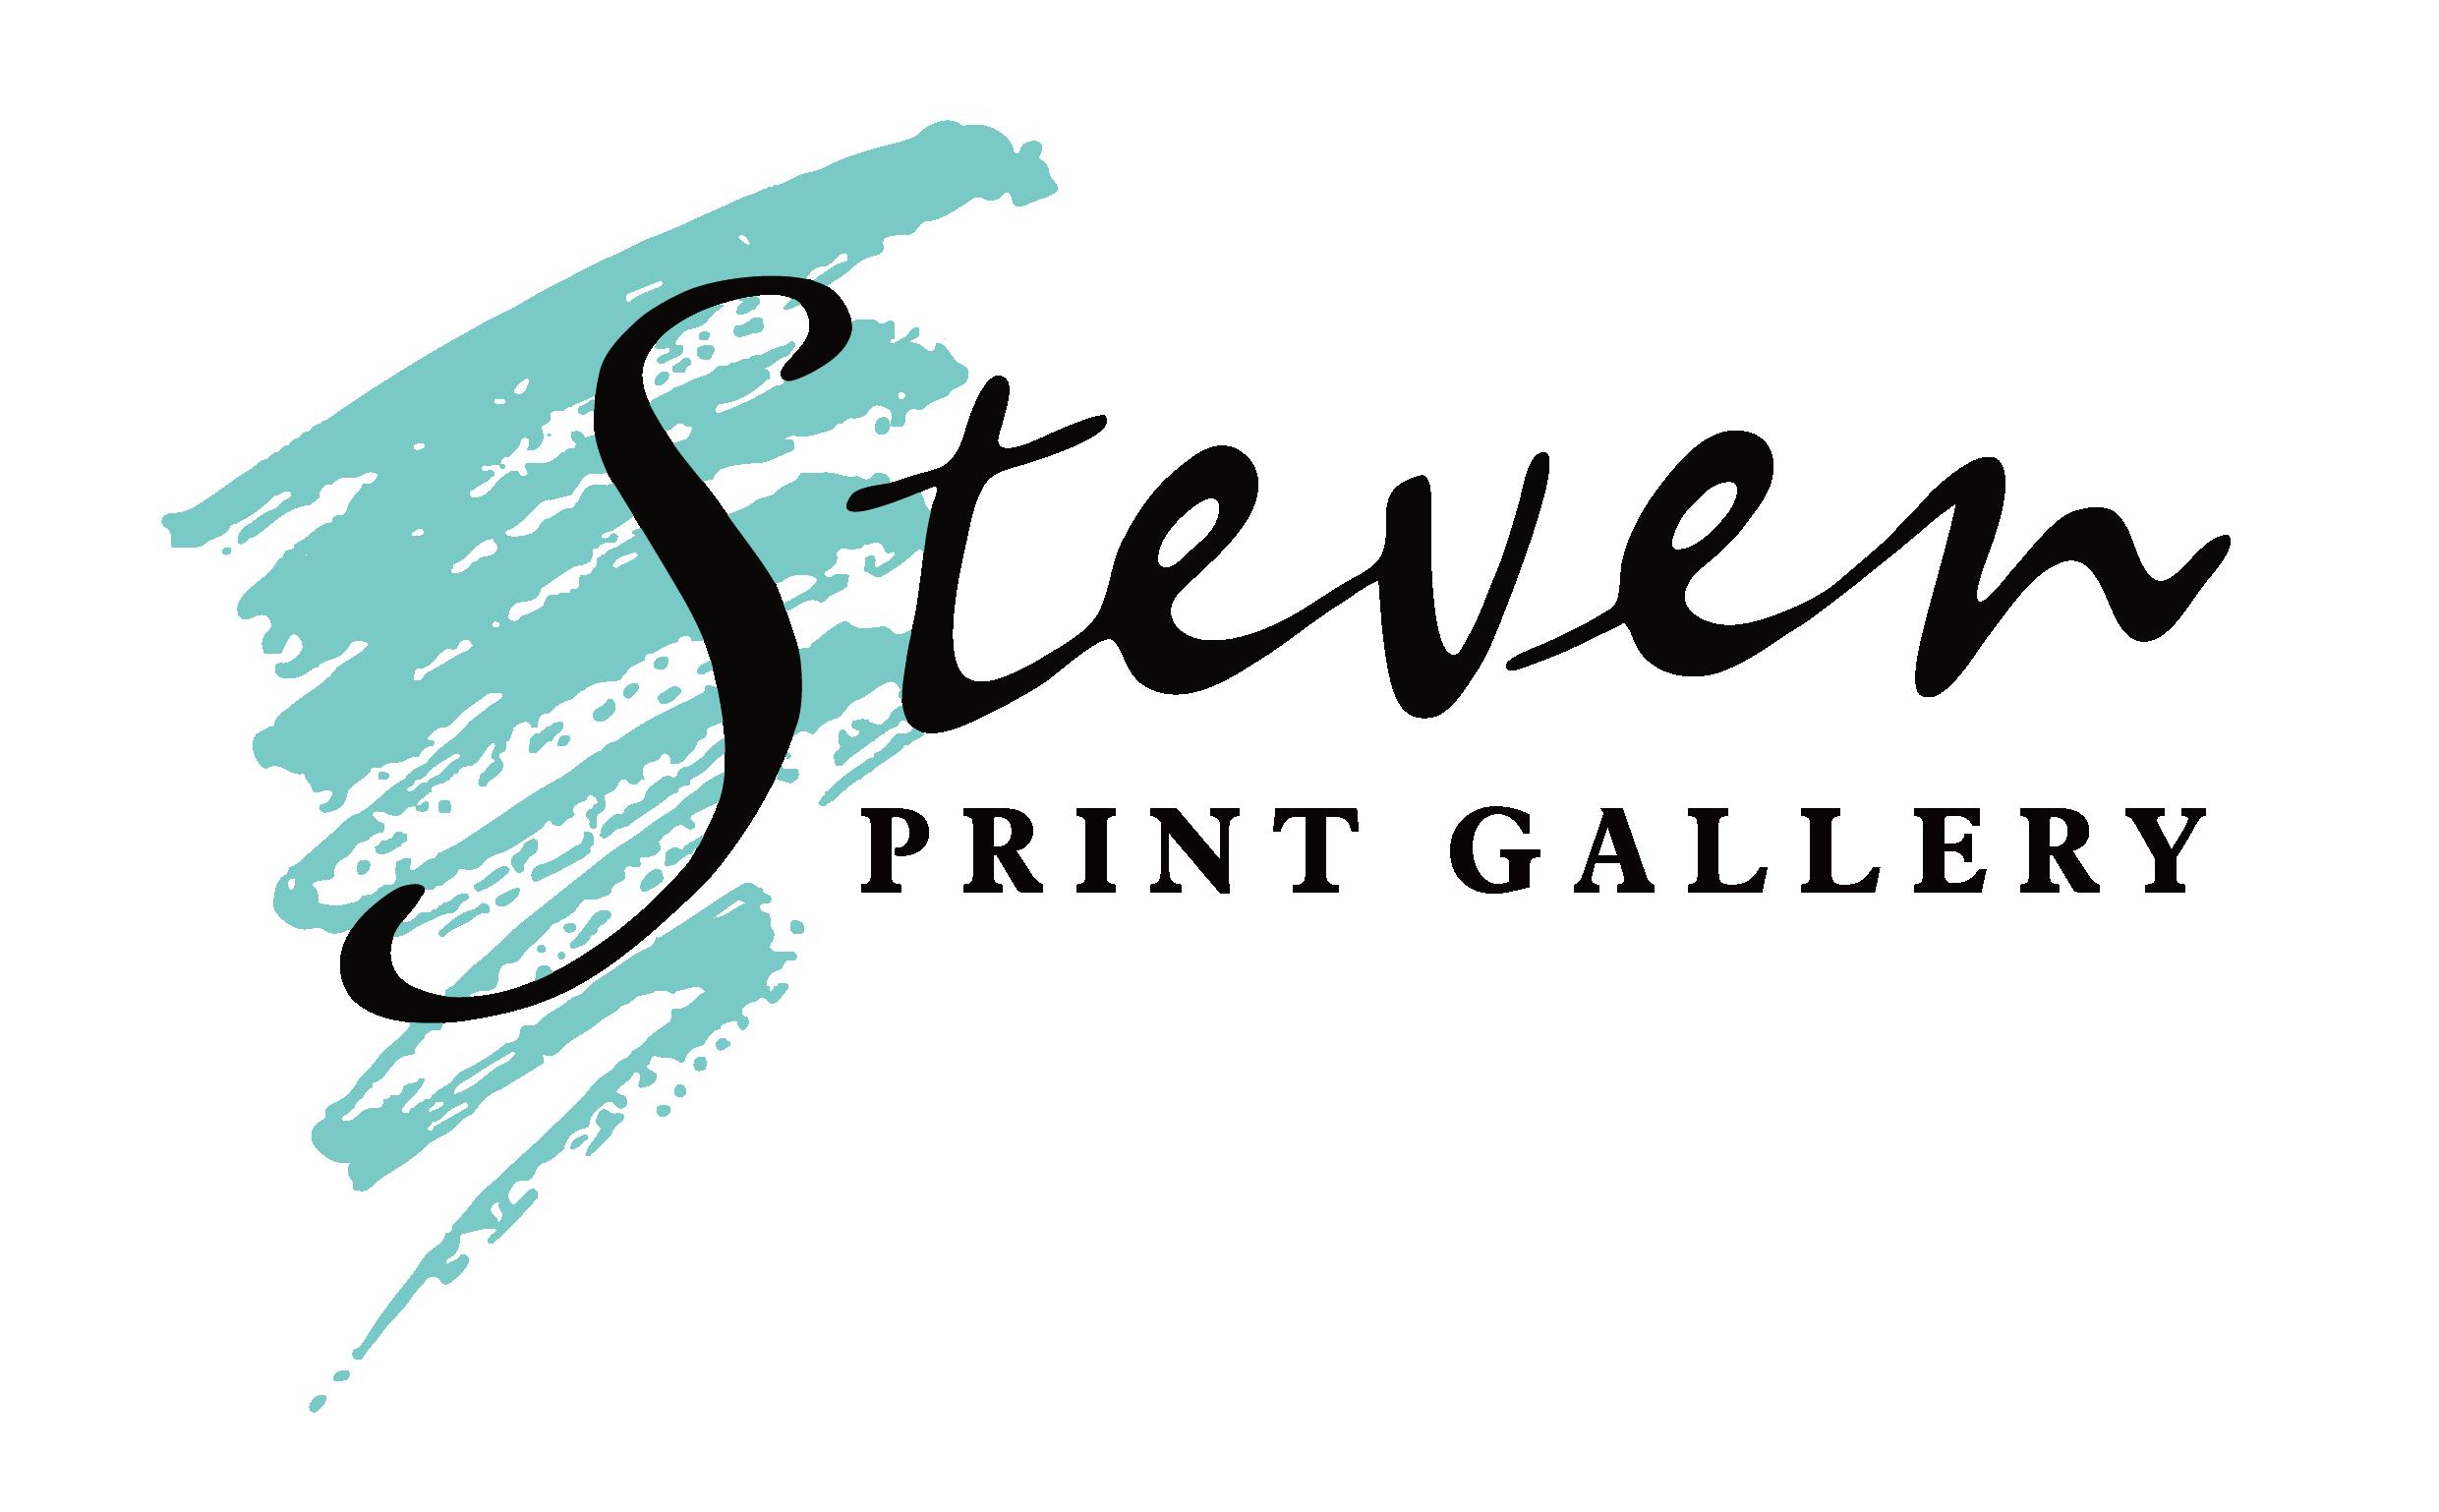 Steven Print Gallery